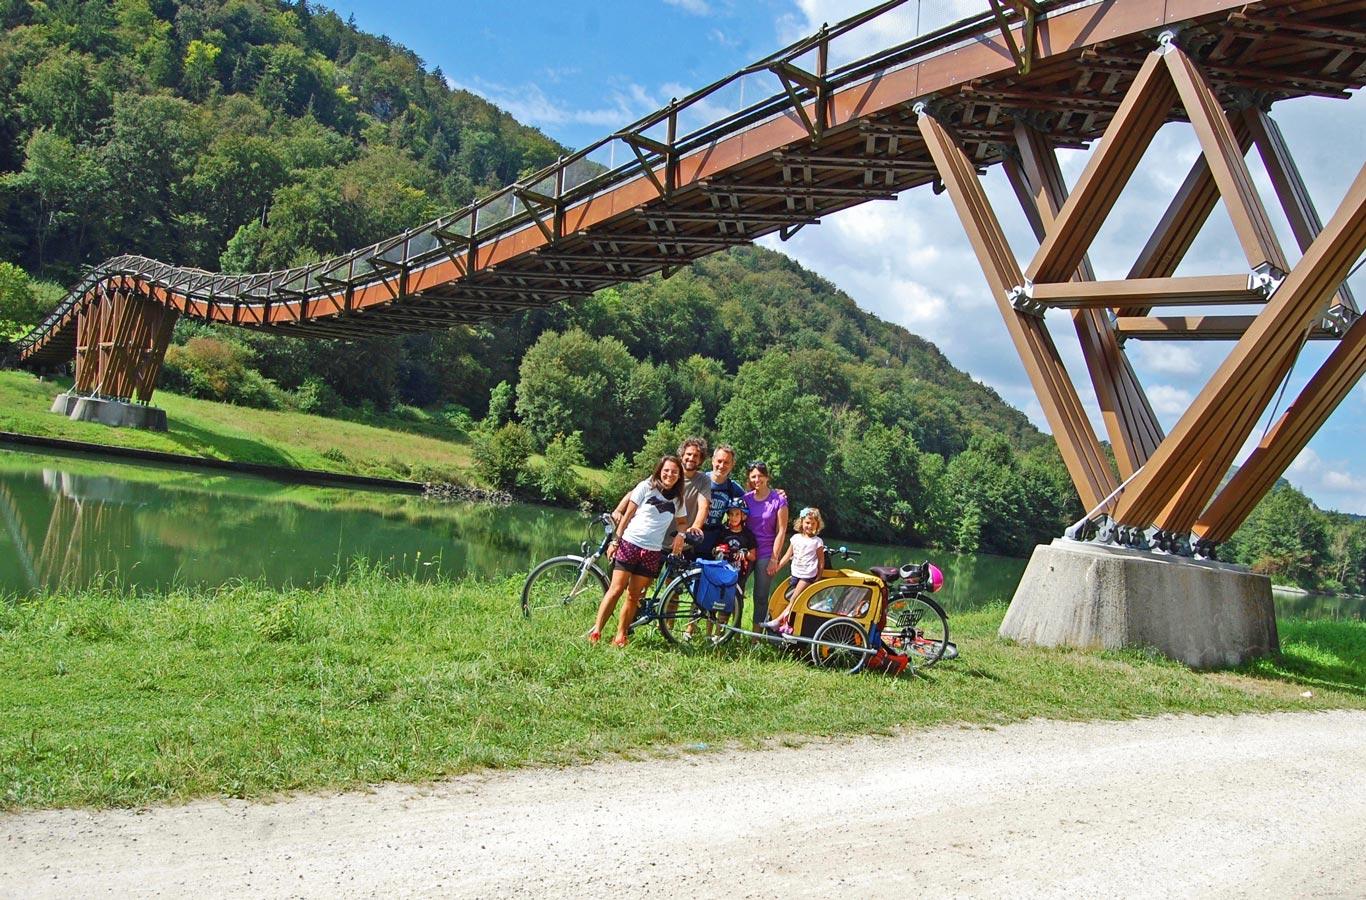 Ponte ciclabile Altmuehl Essing